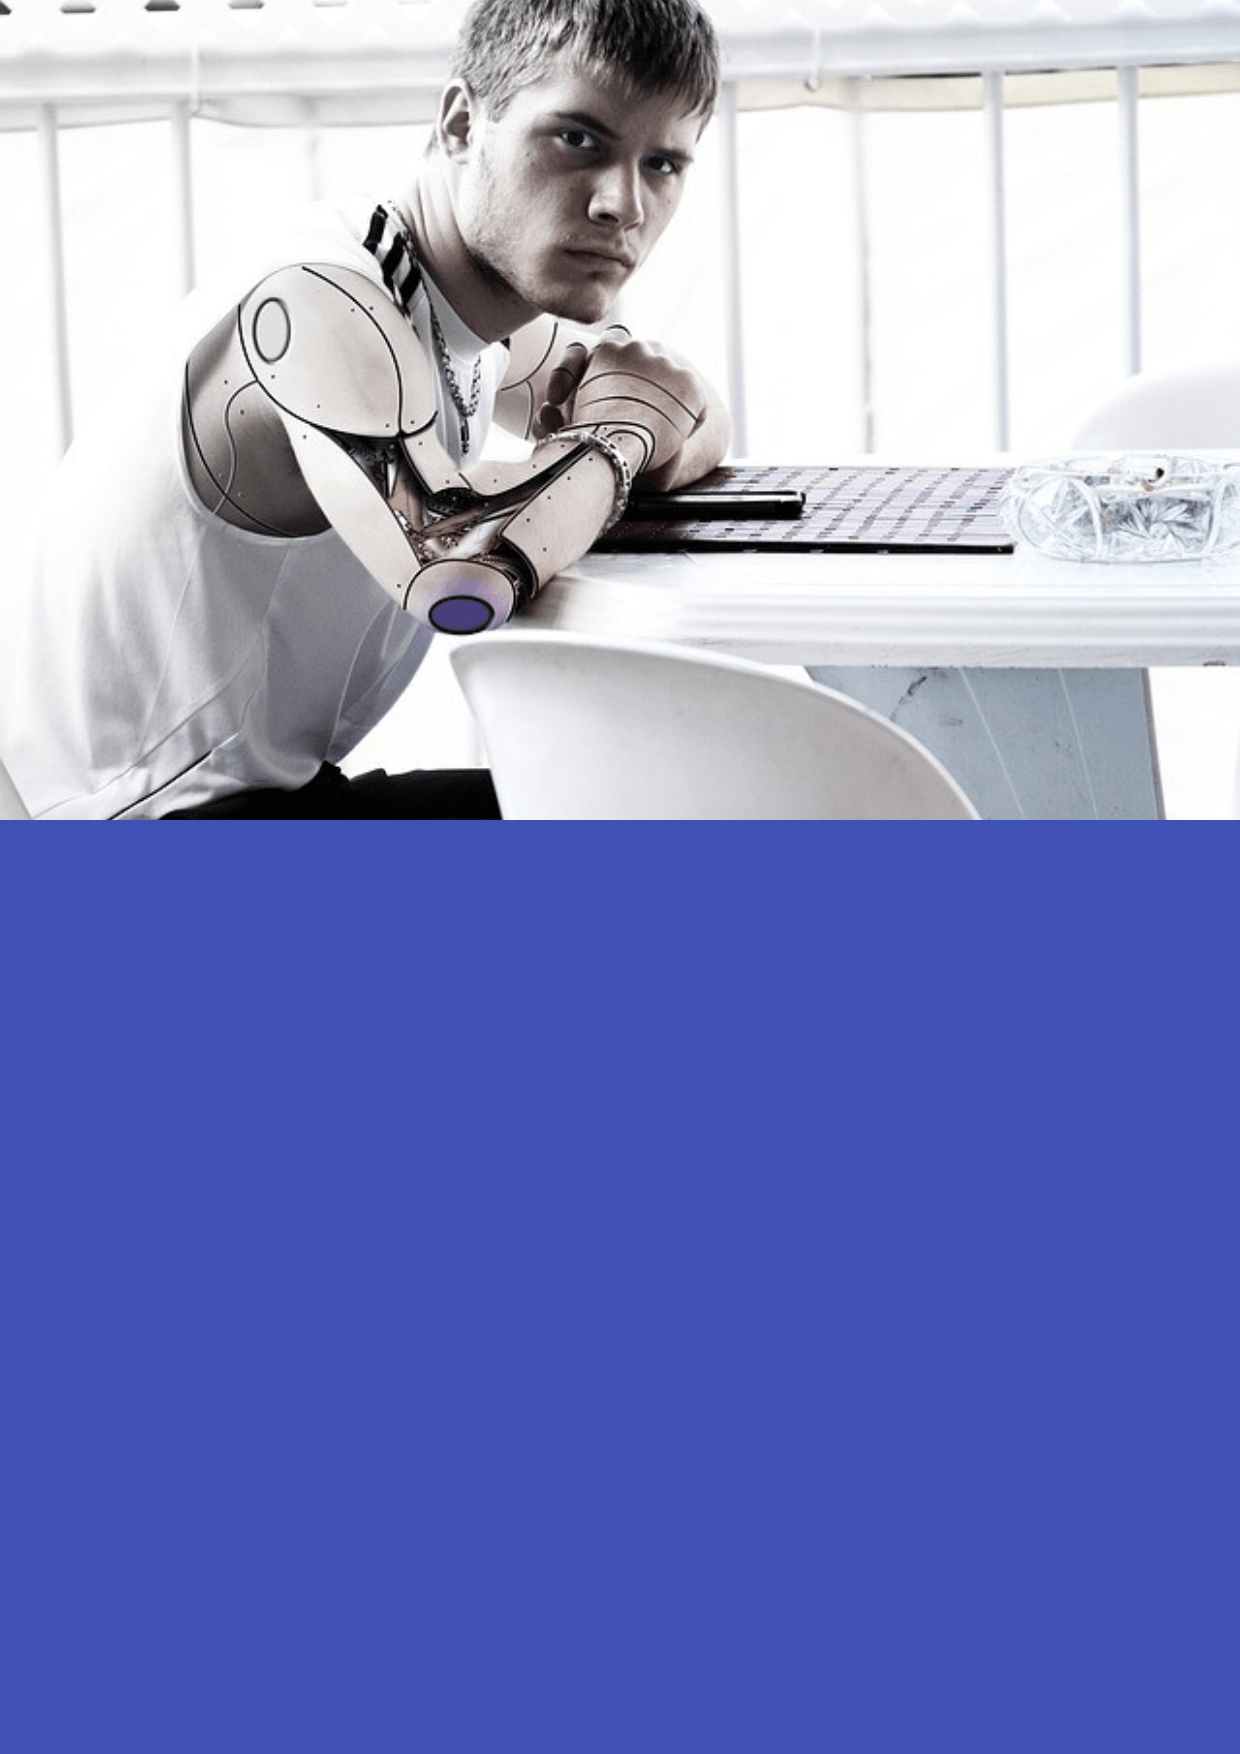 Scratch,                White,                Blue,                 Free Image